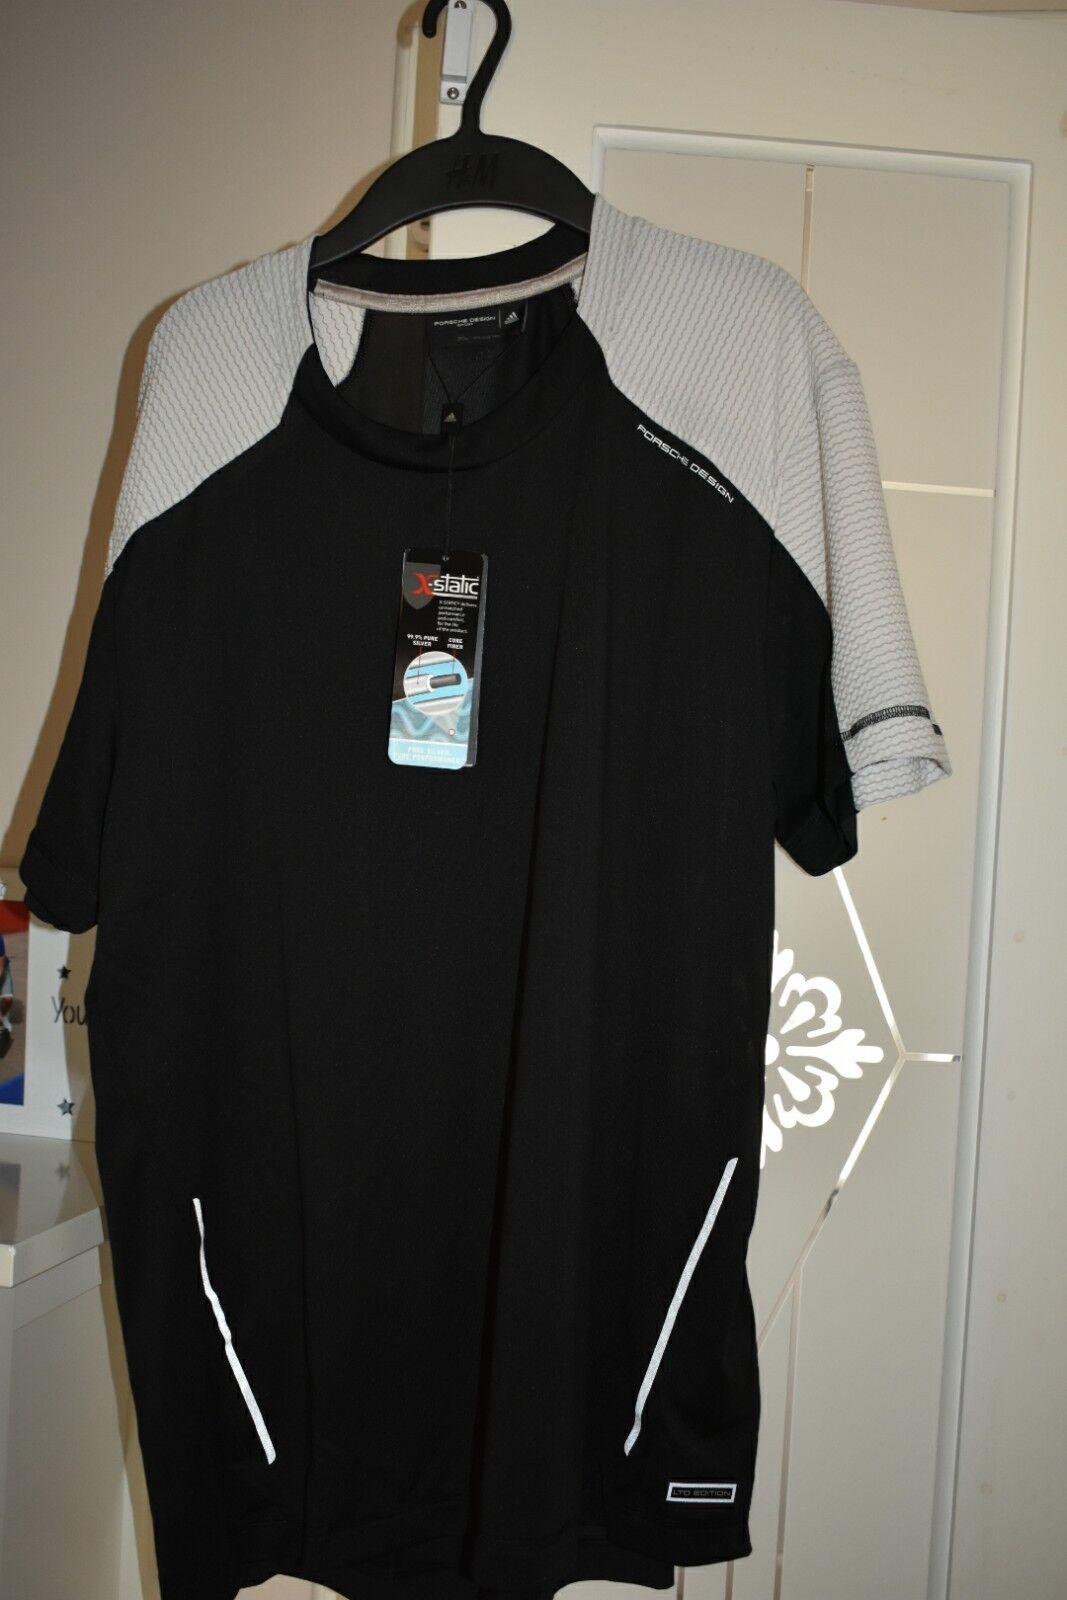 9cbc9b75 Adidas Porche Design Sport BS Size UK XL TEE BNWT oifigr17042-T-Shirts